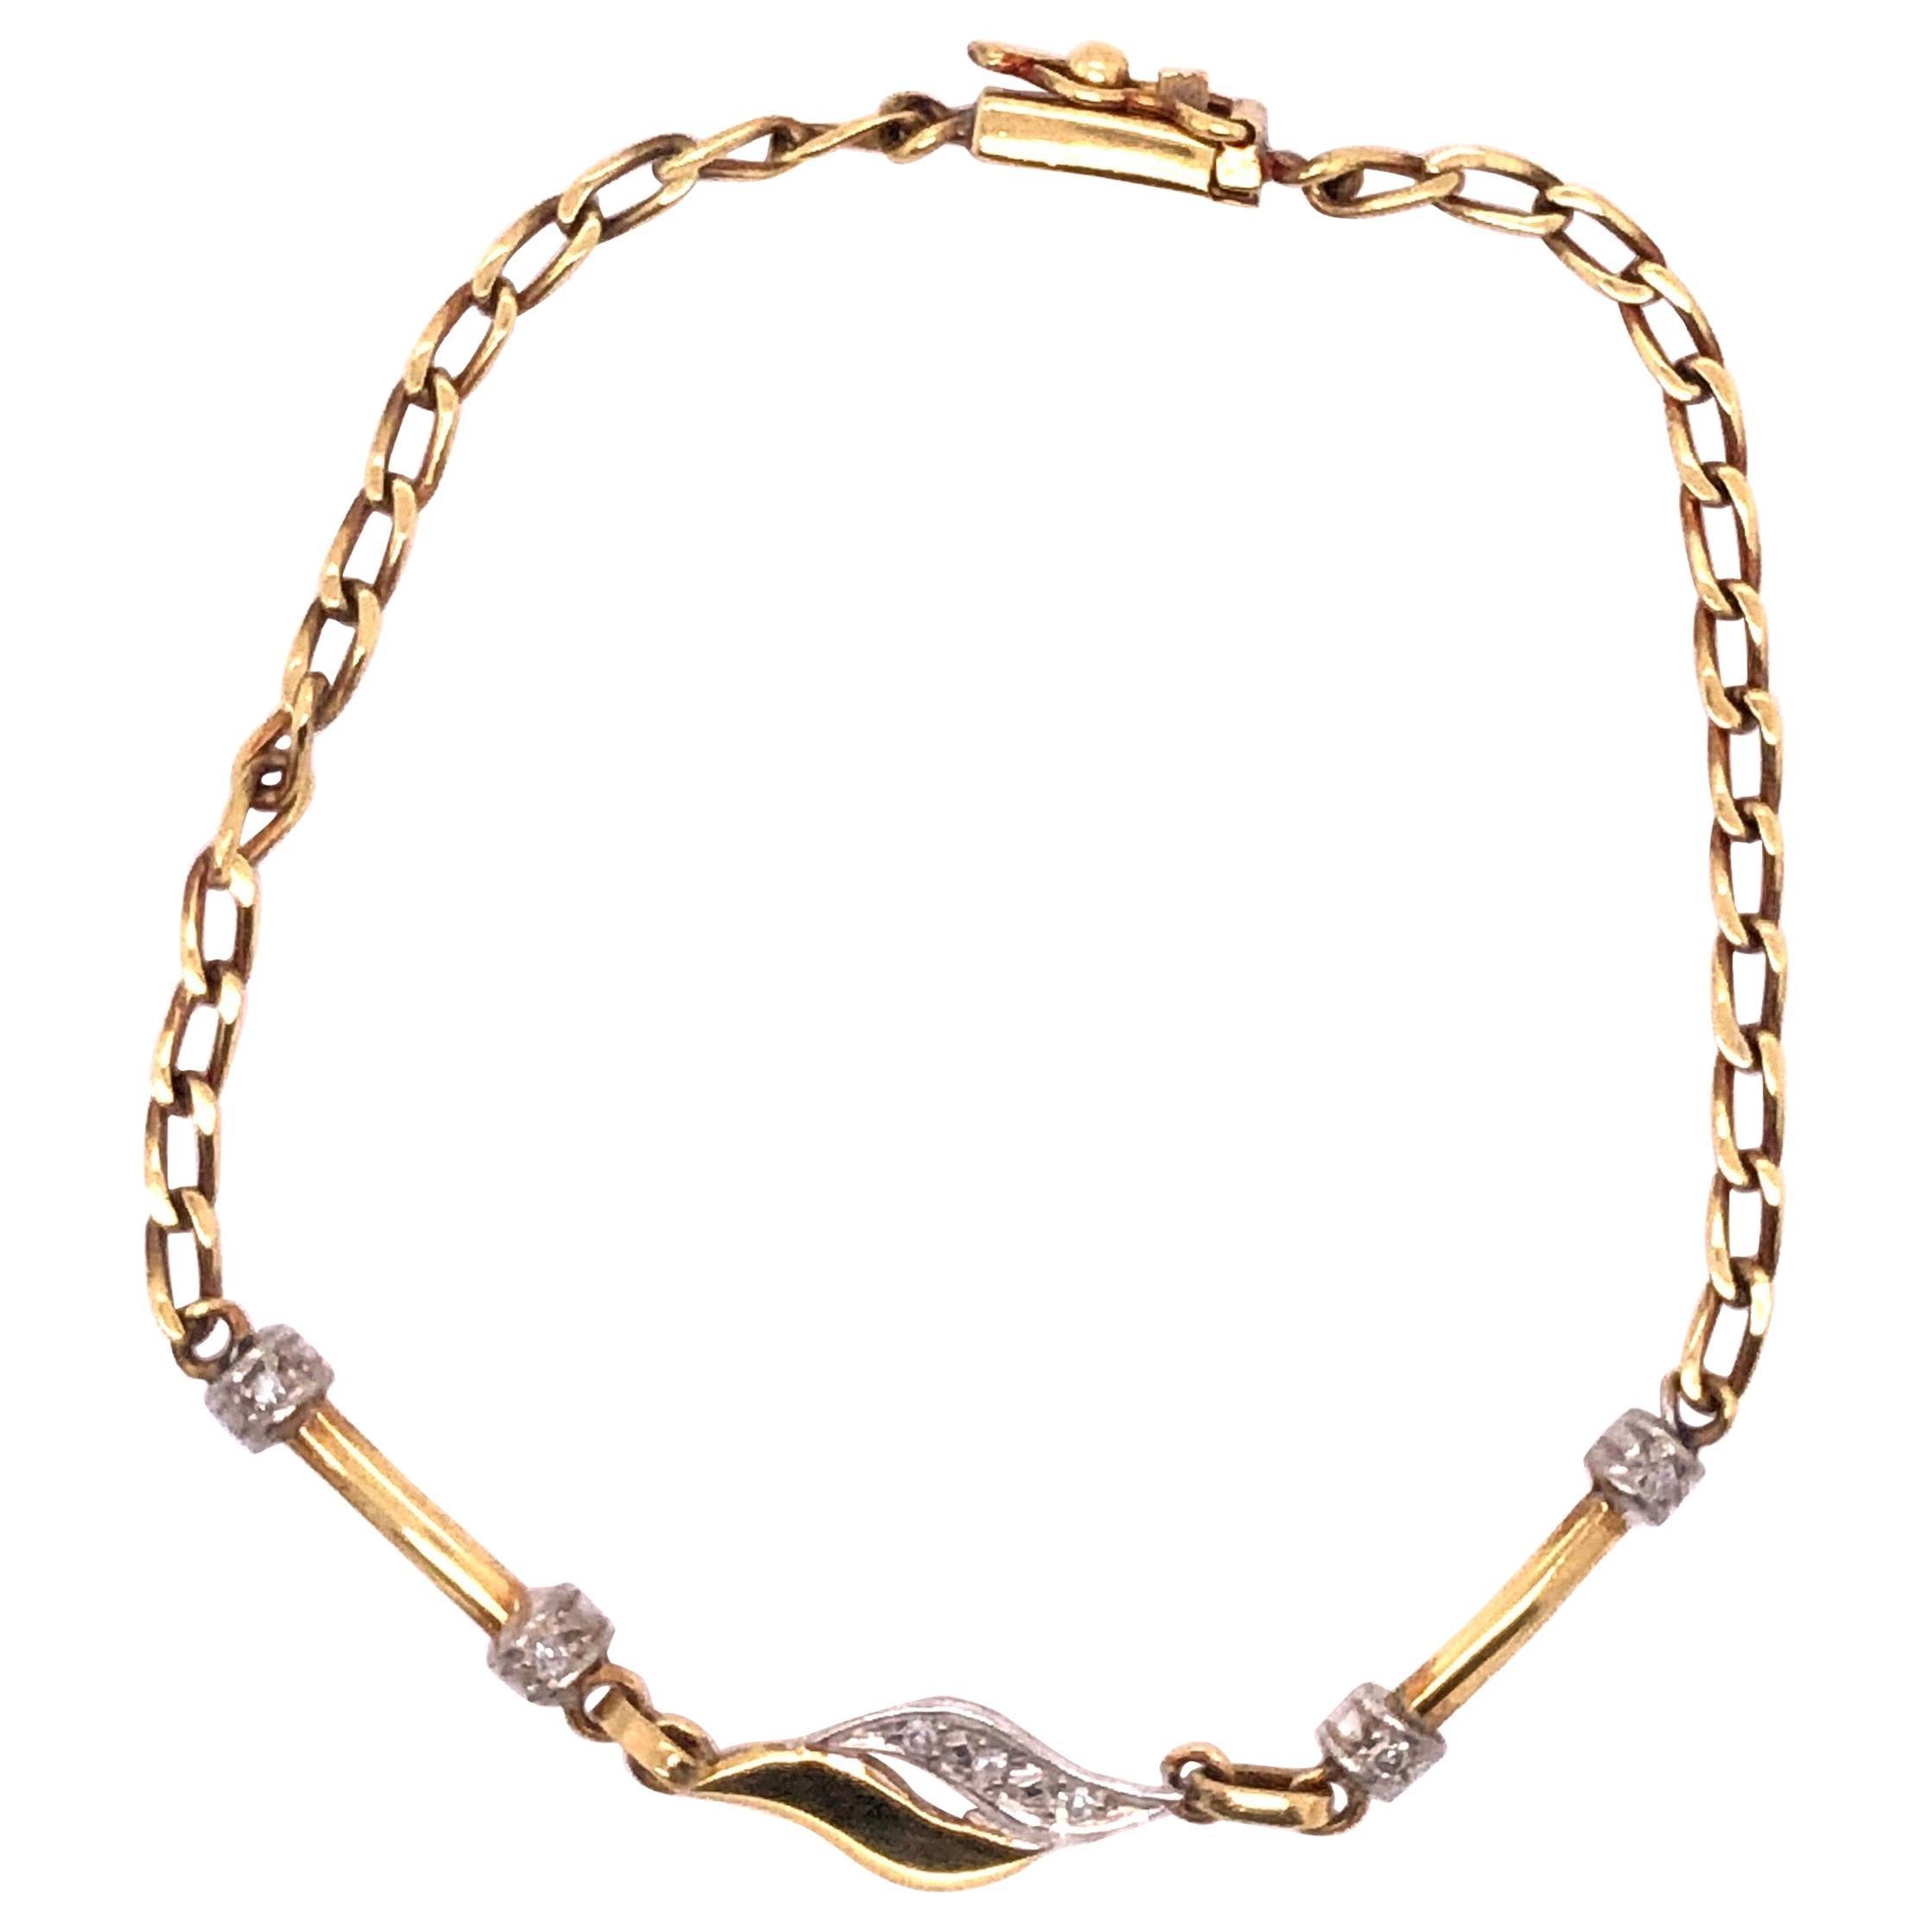 18 Karat Yellow and White Gold Fancy Link Bracelet